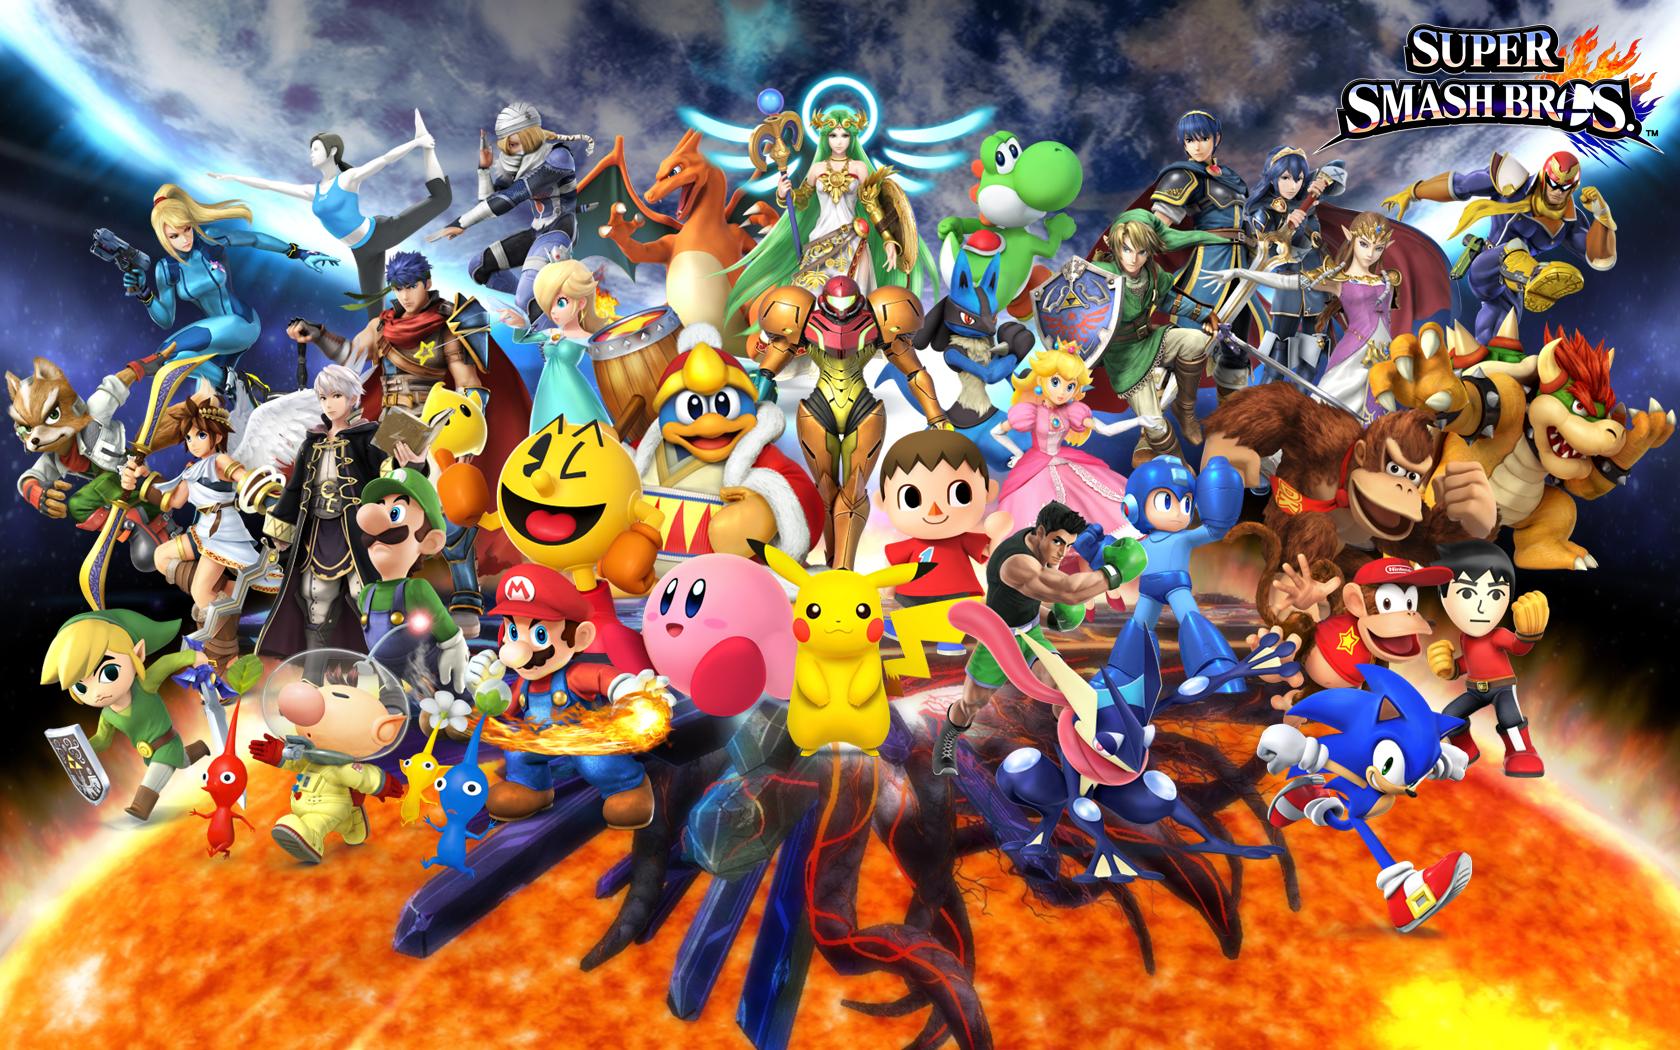 49 Smash Bros Wallpaper Reddit On Wallpapersafari